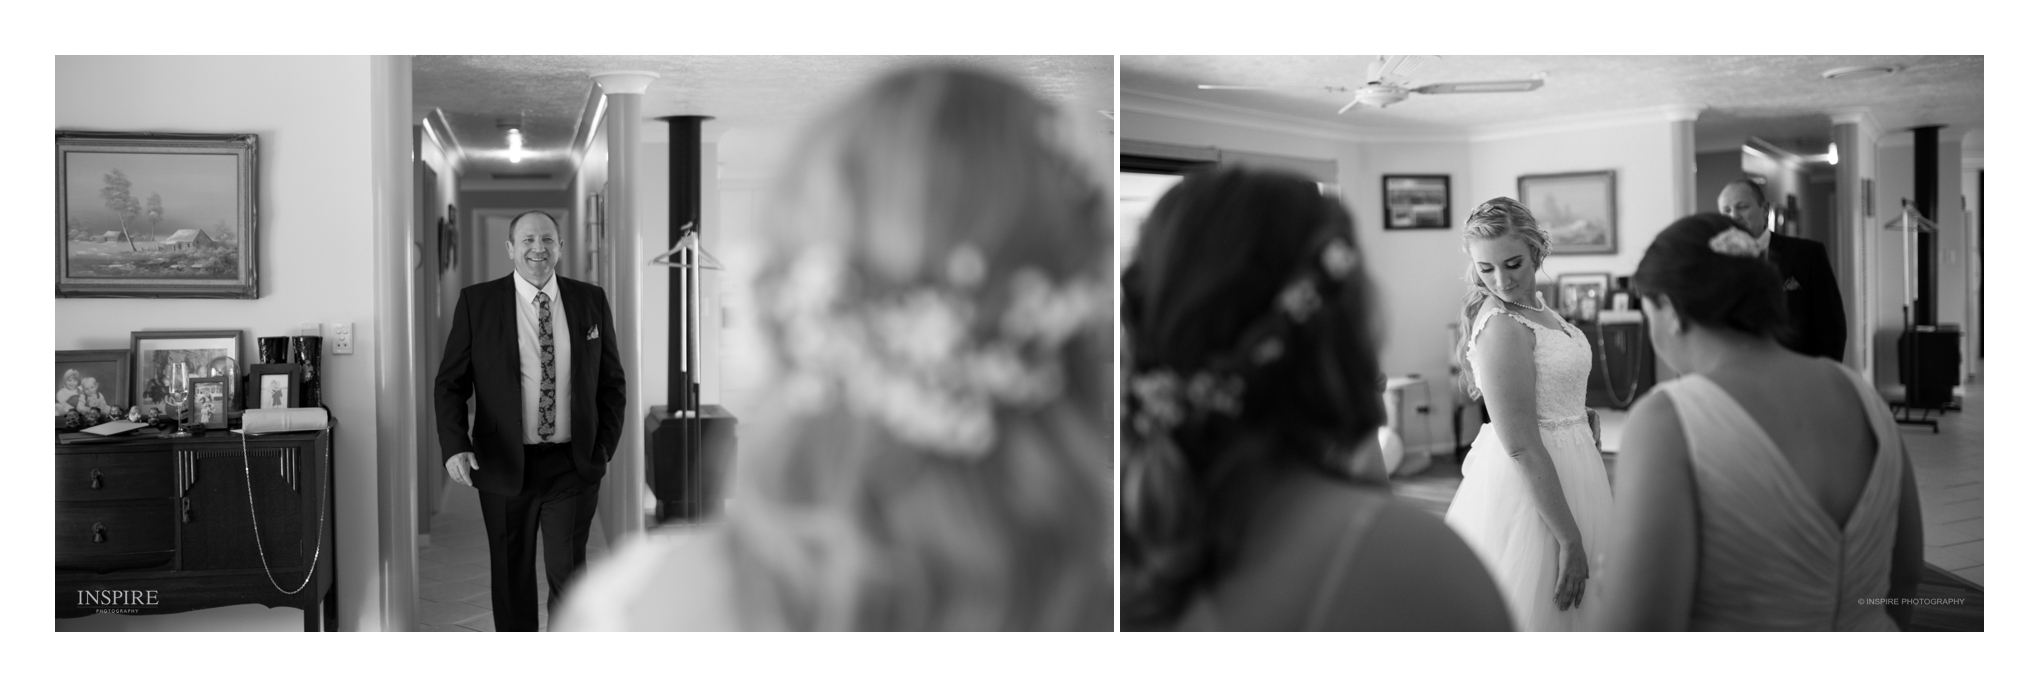 Nick & Bree wedding blog 11.jpg